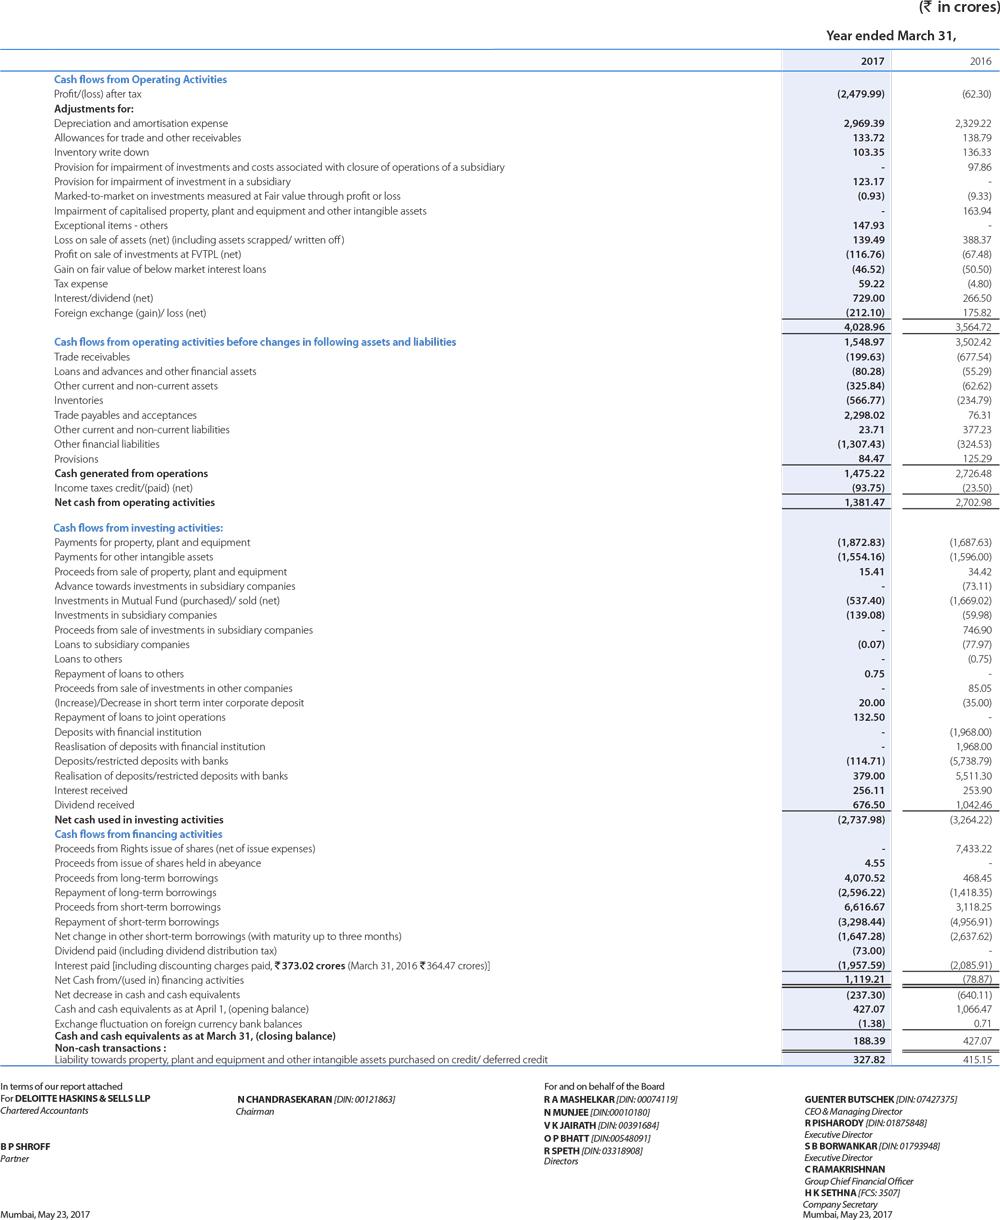 cash flow statement tata motors annual report 2016 17